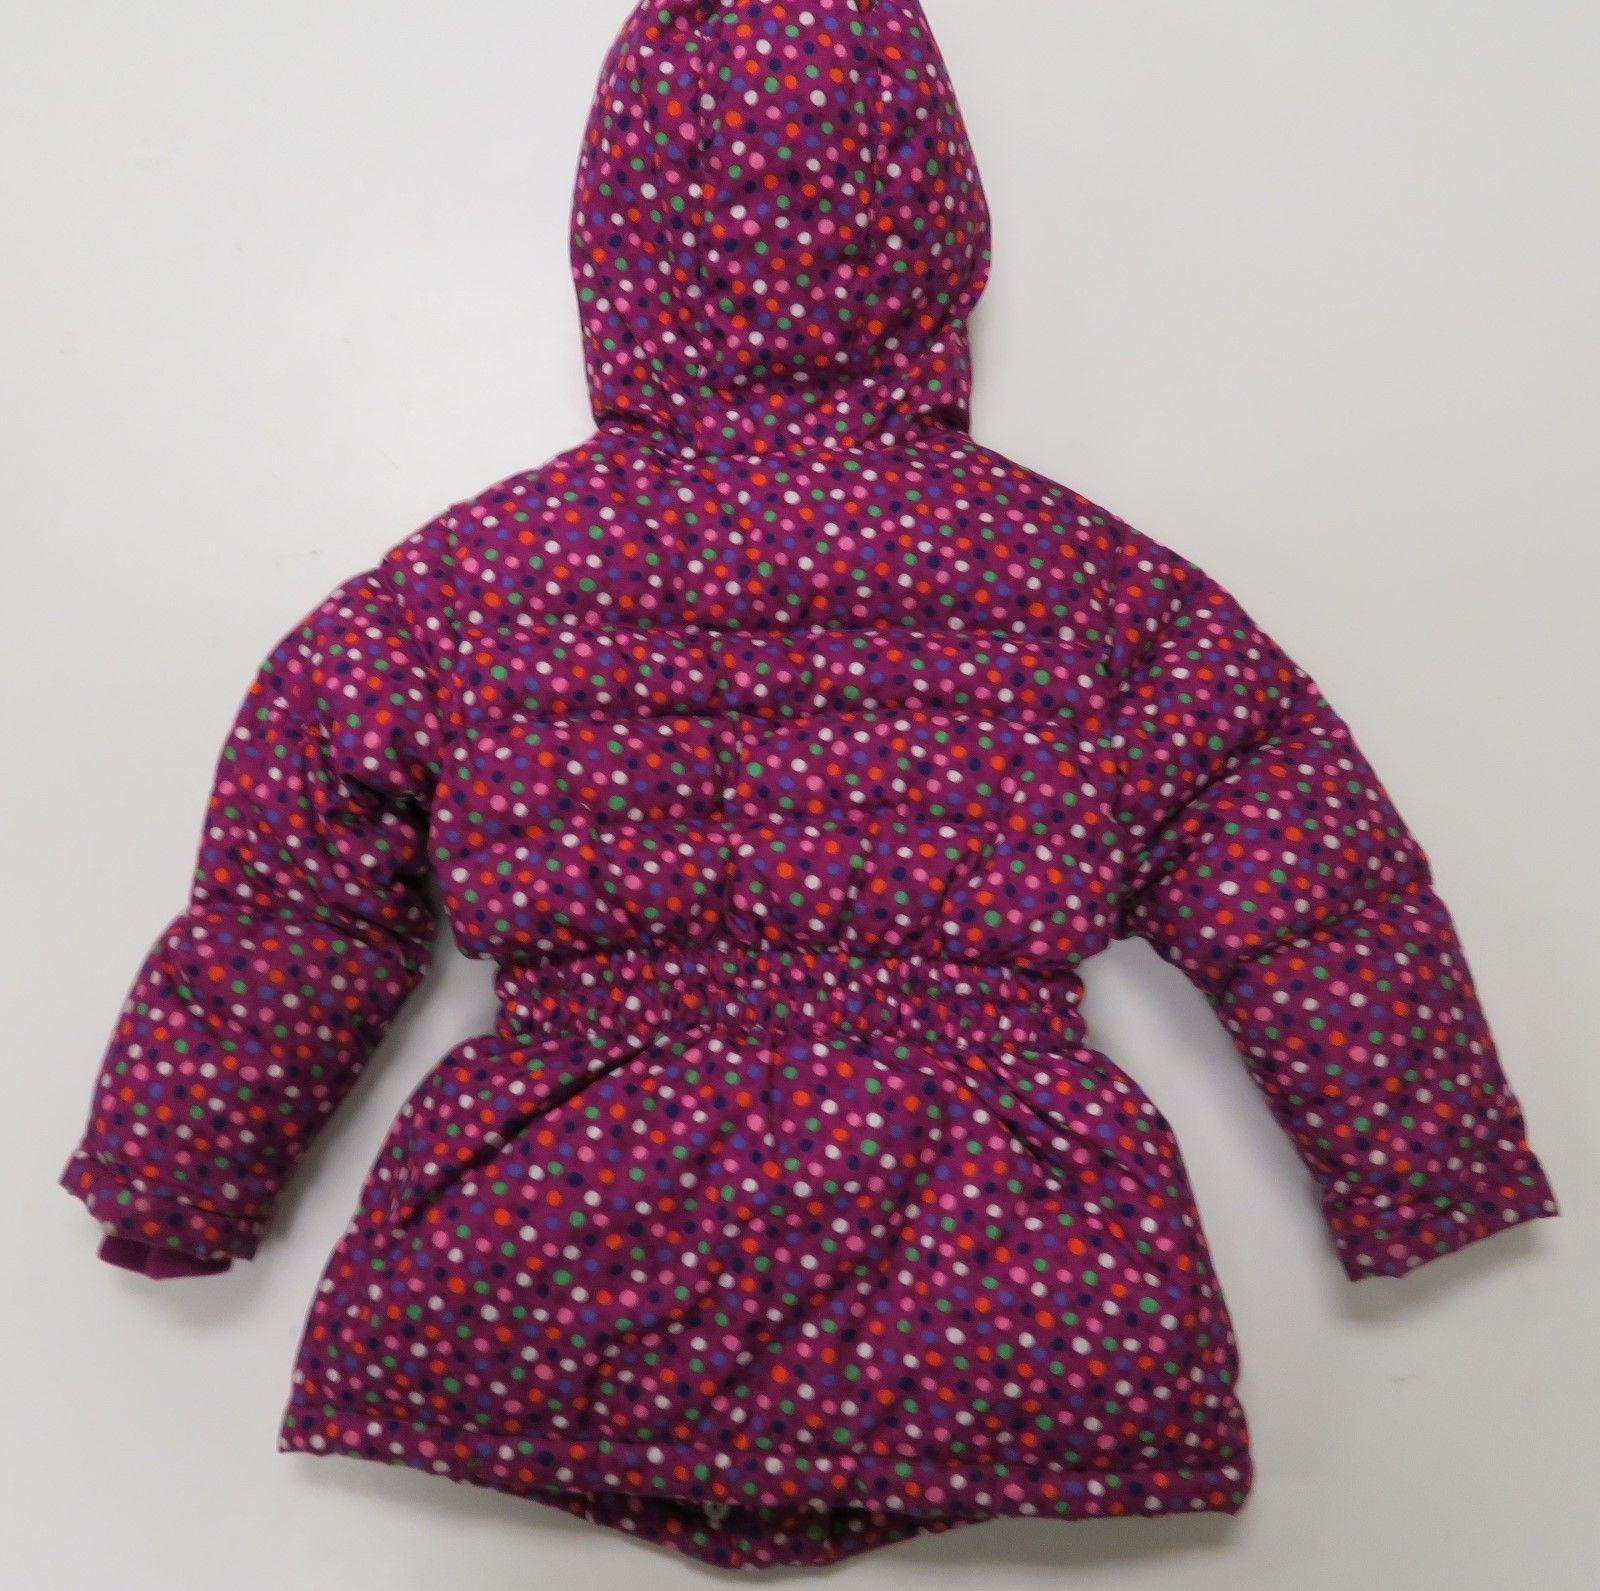 Hanna Andersson Girls sz 110 Purple Polka Dot Puffy Down Jacket Coat Winter Hood